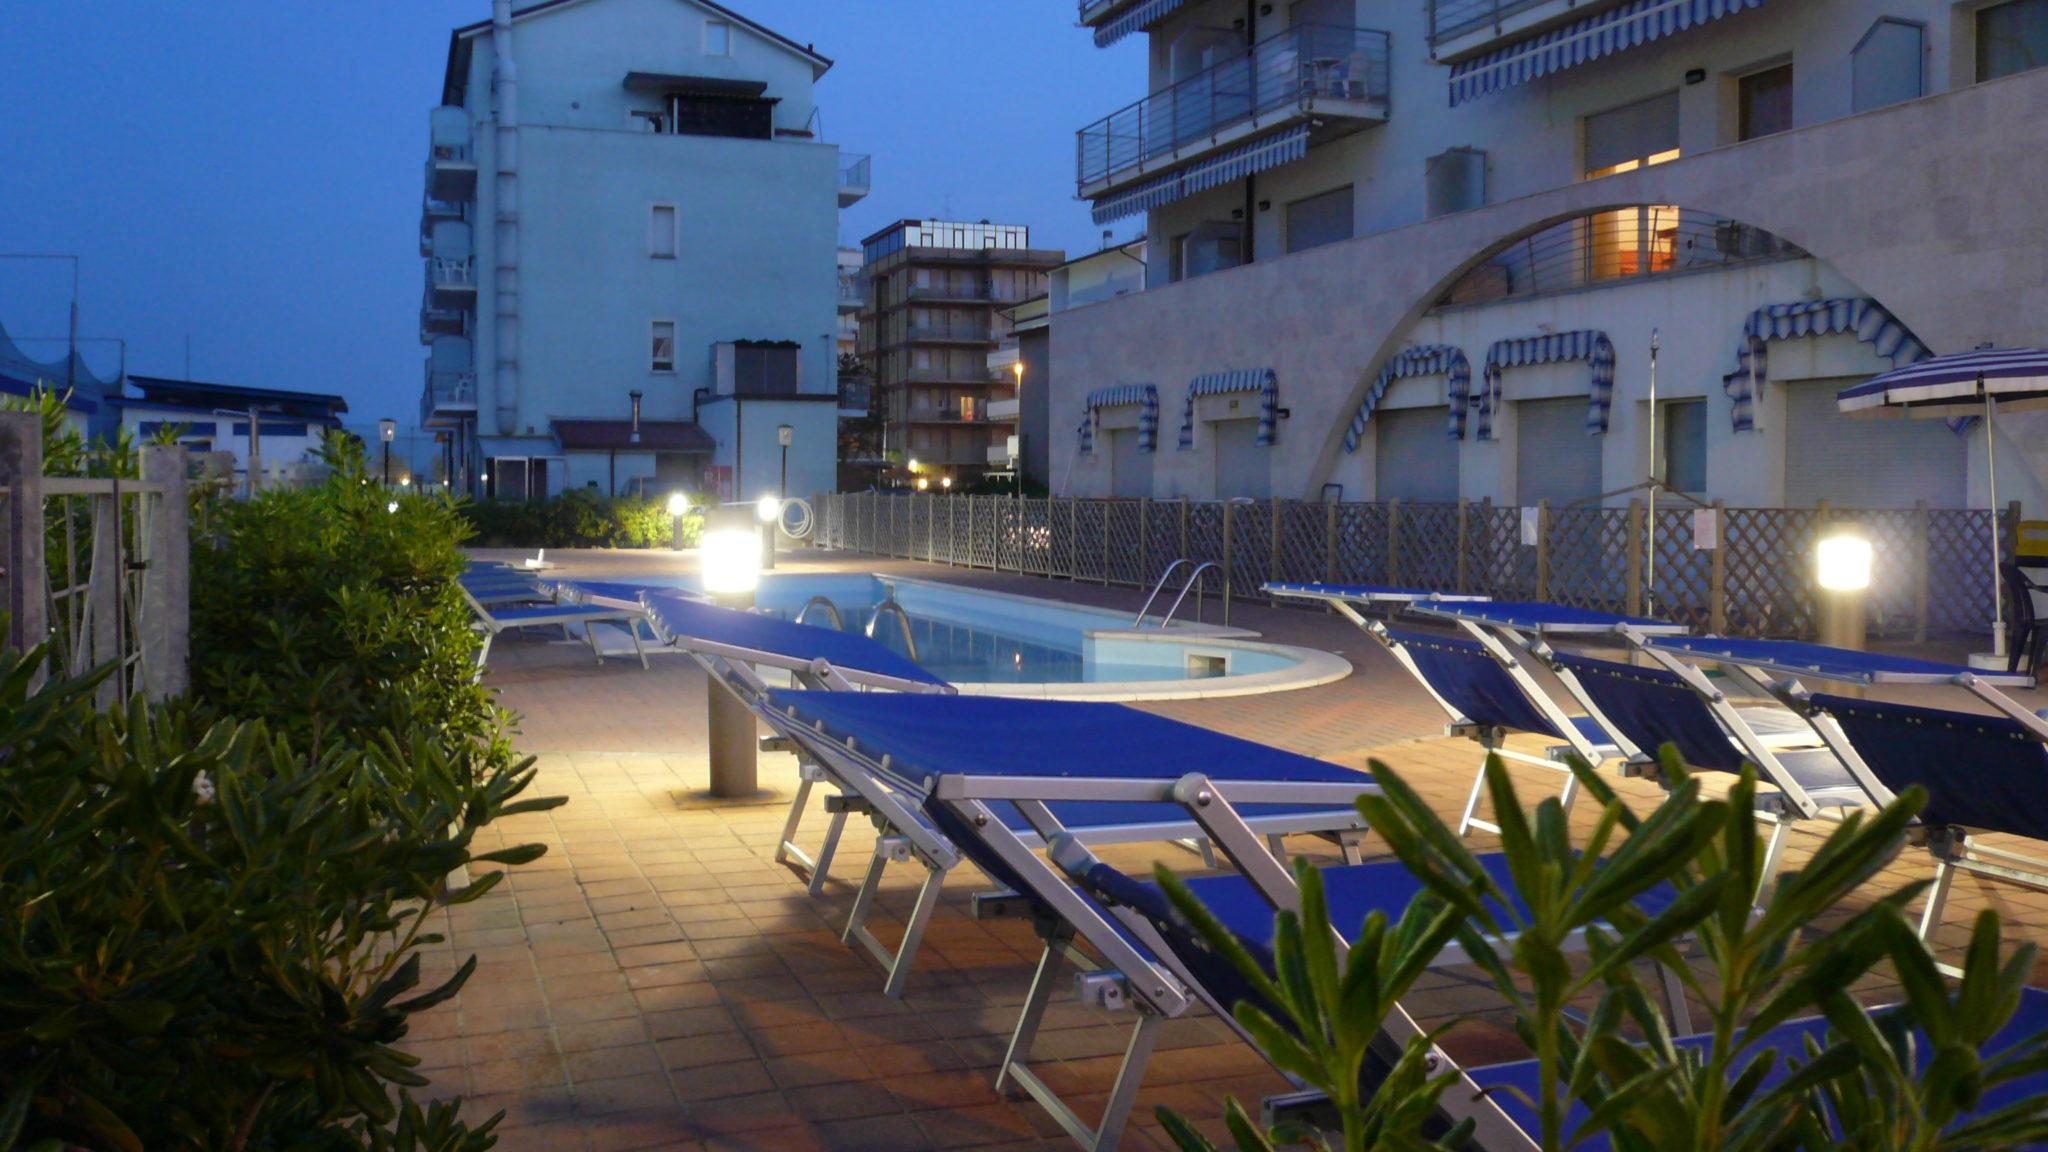 Residence moderno 3 stelle a milano marittima con piscina - Residence cattolica con piscina ...